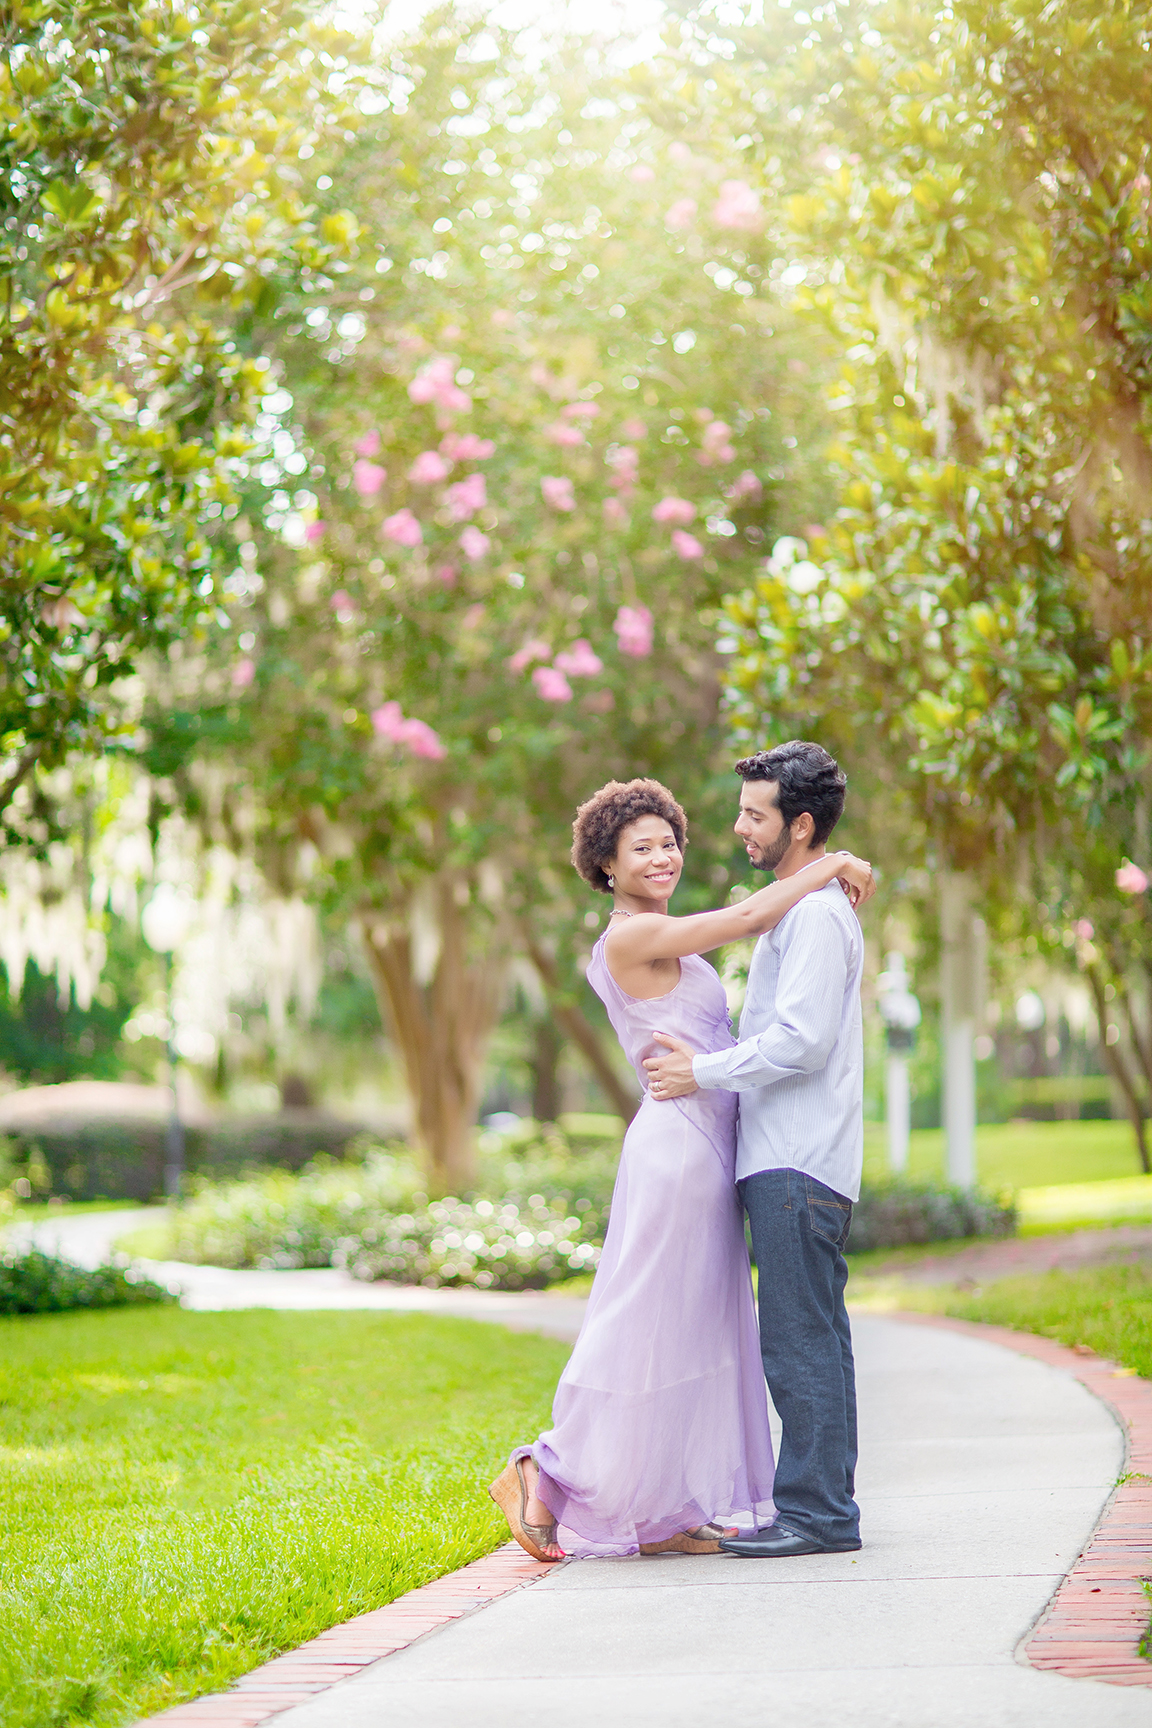 DBatista Photography_engagement photography_wedding photographer orlando florida